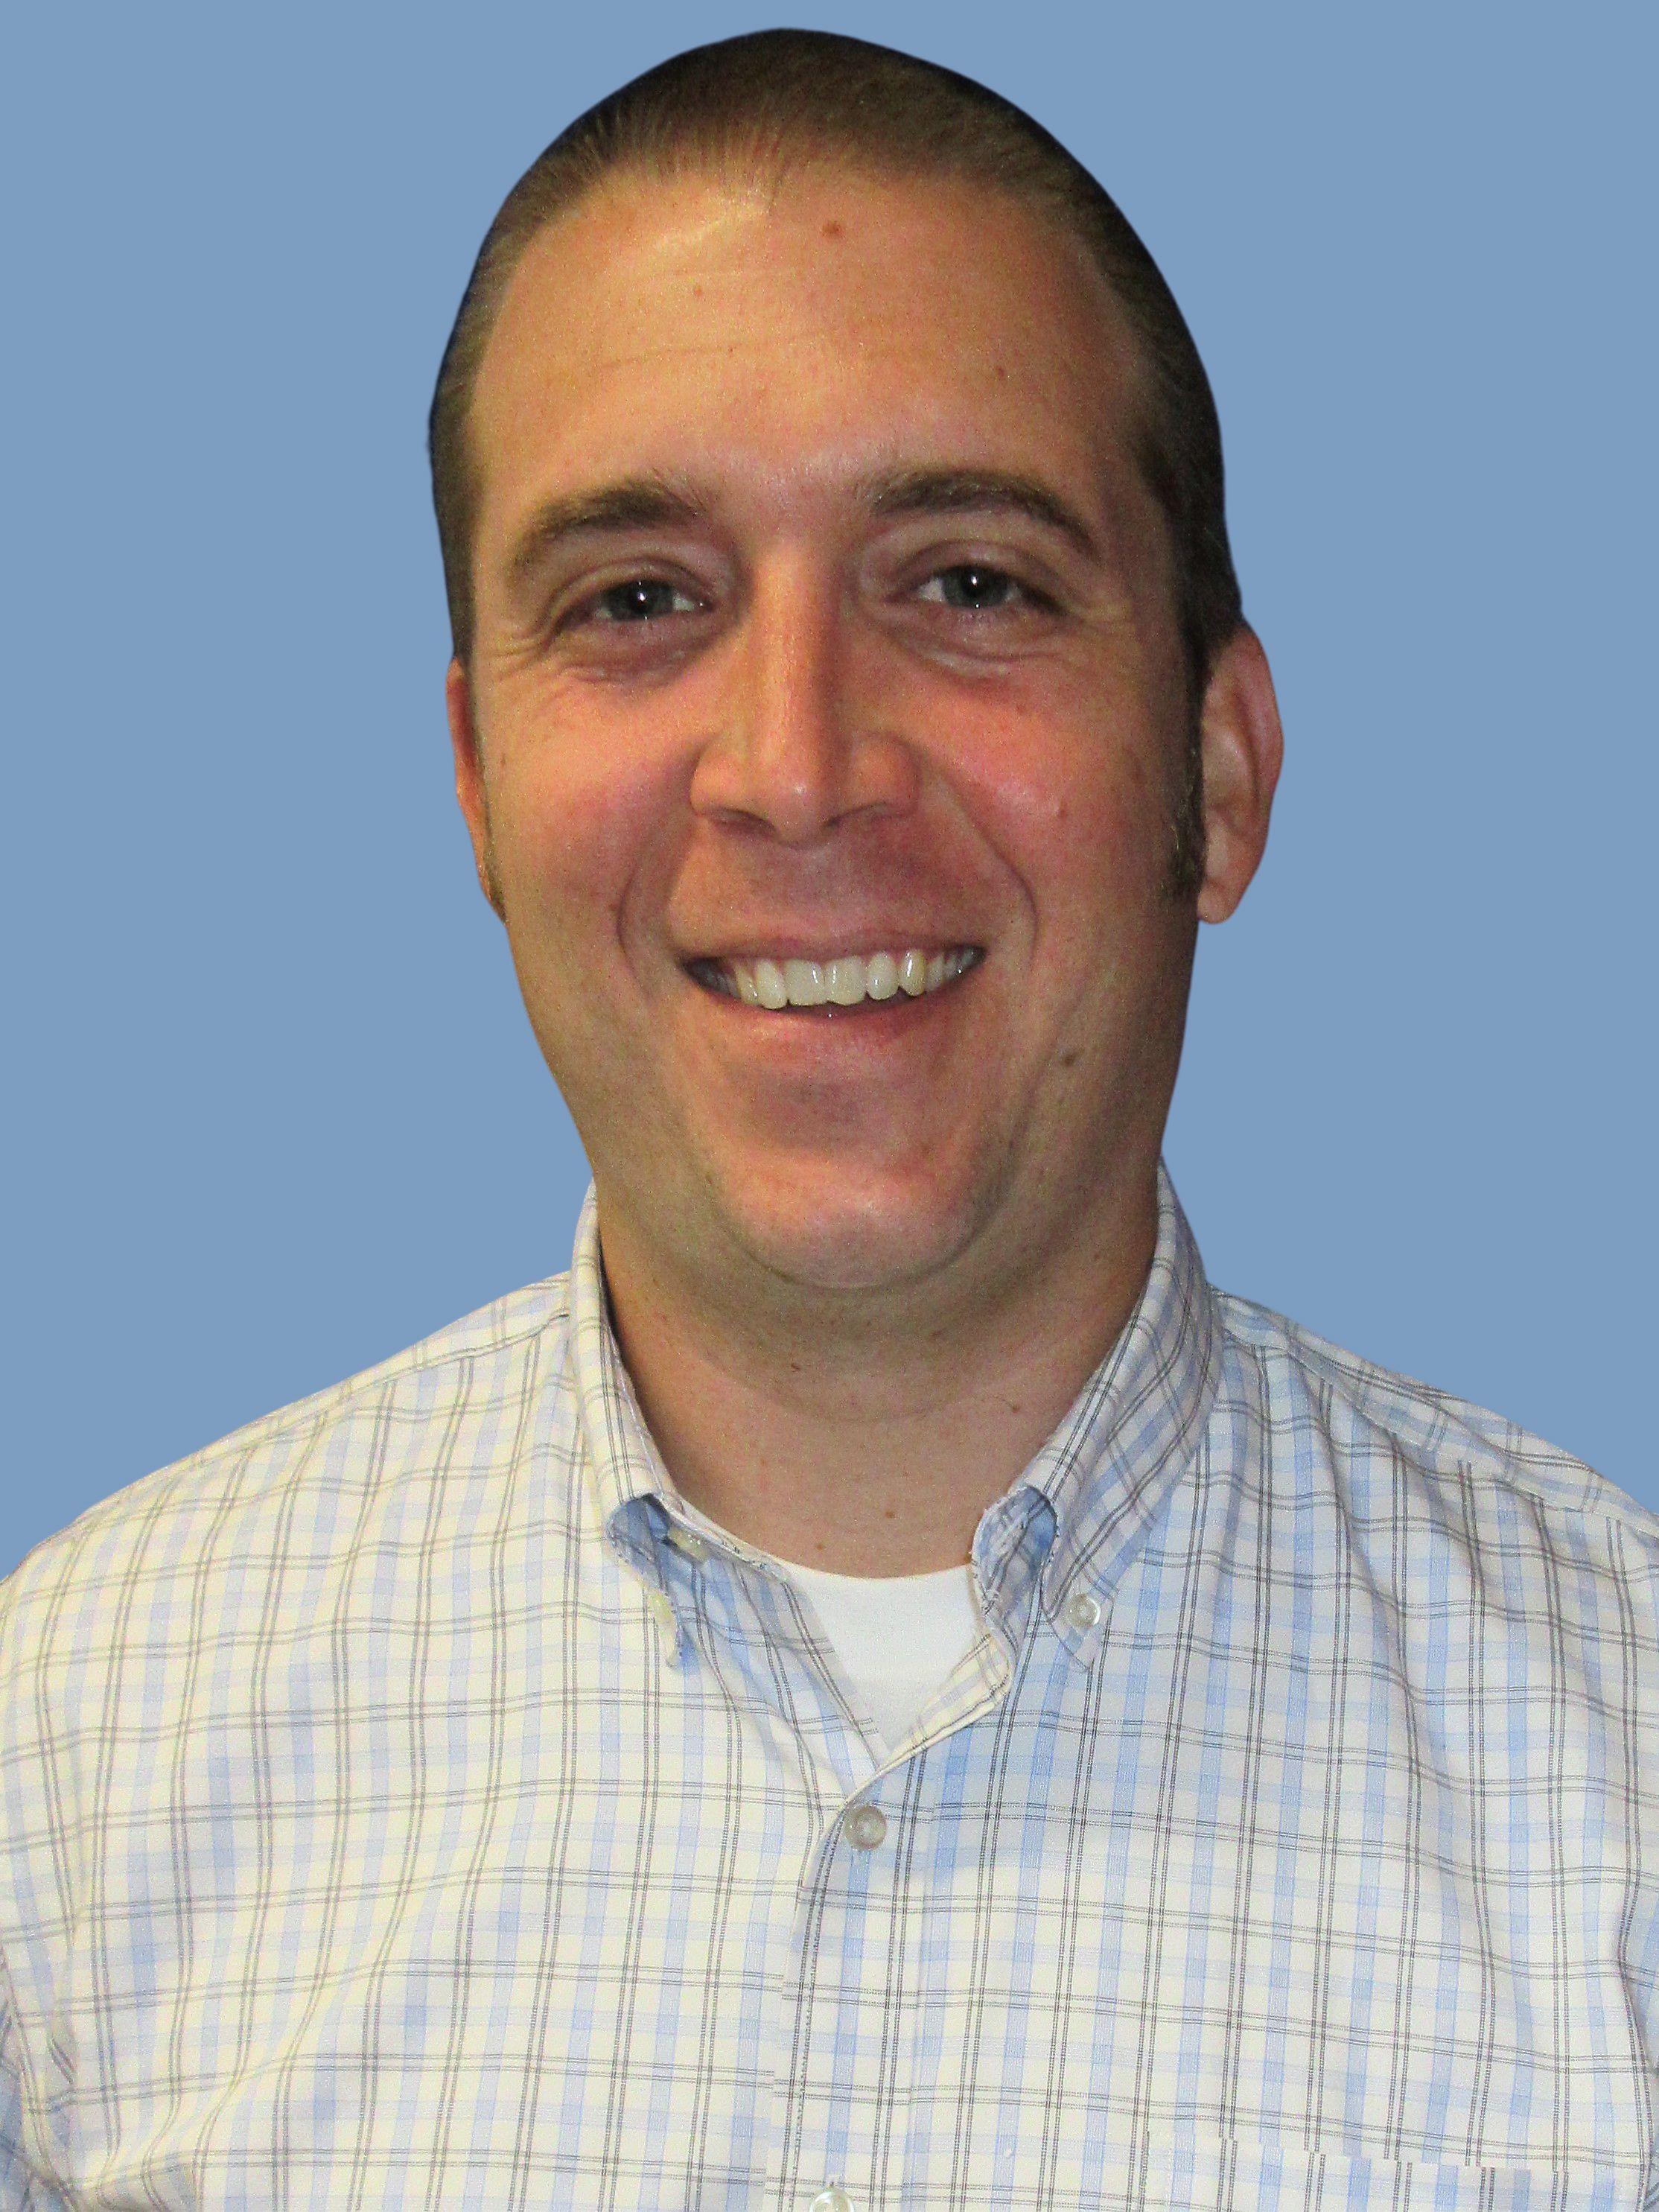 Joel Nickerson